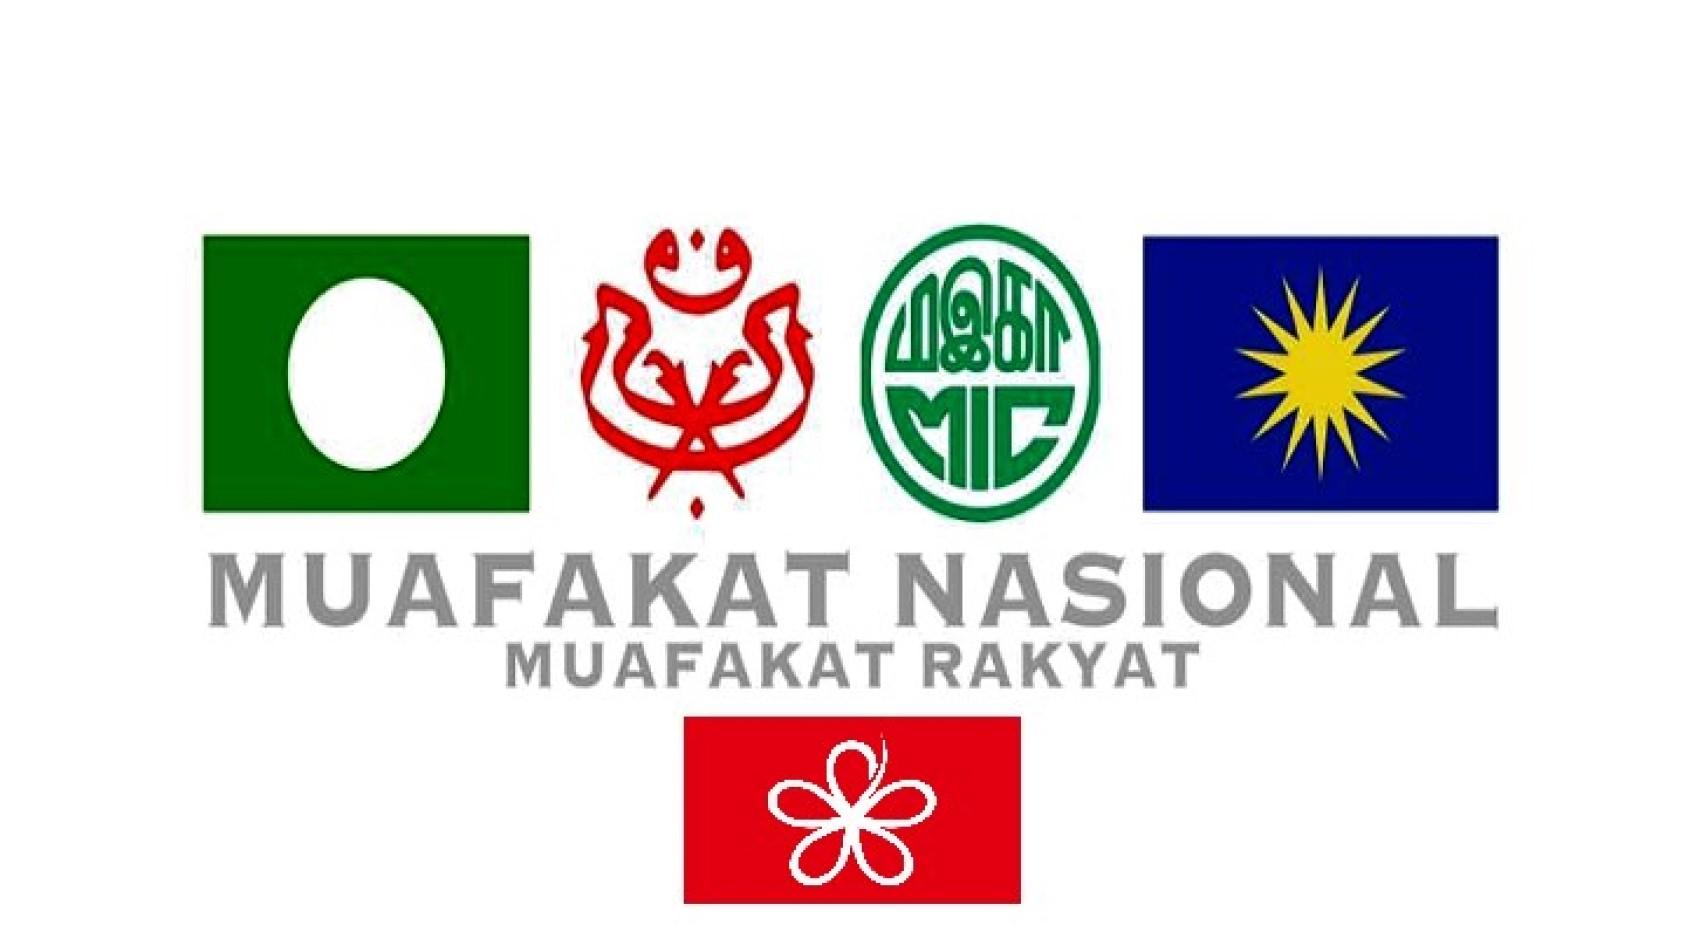 Bersatu dijangka sertai Muafakat Nasional · My KMU NeT